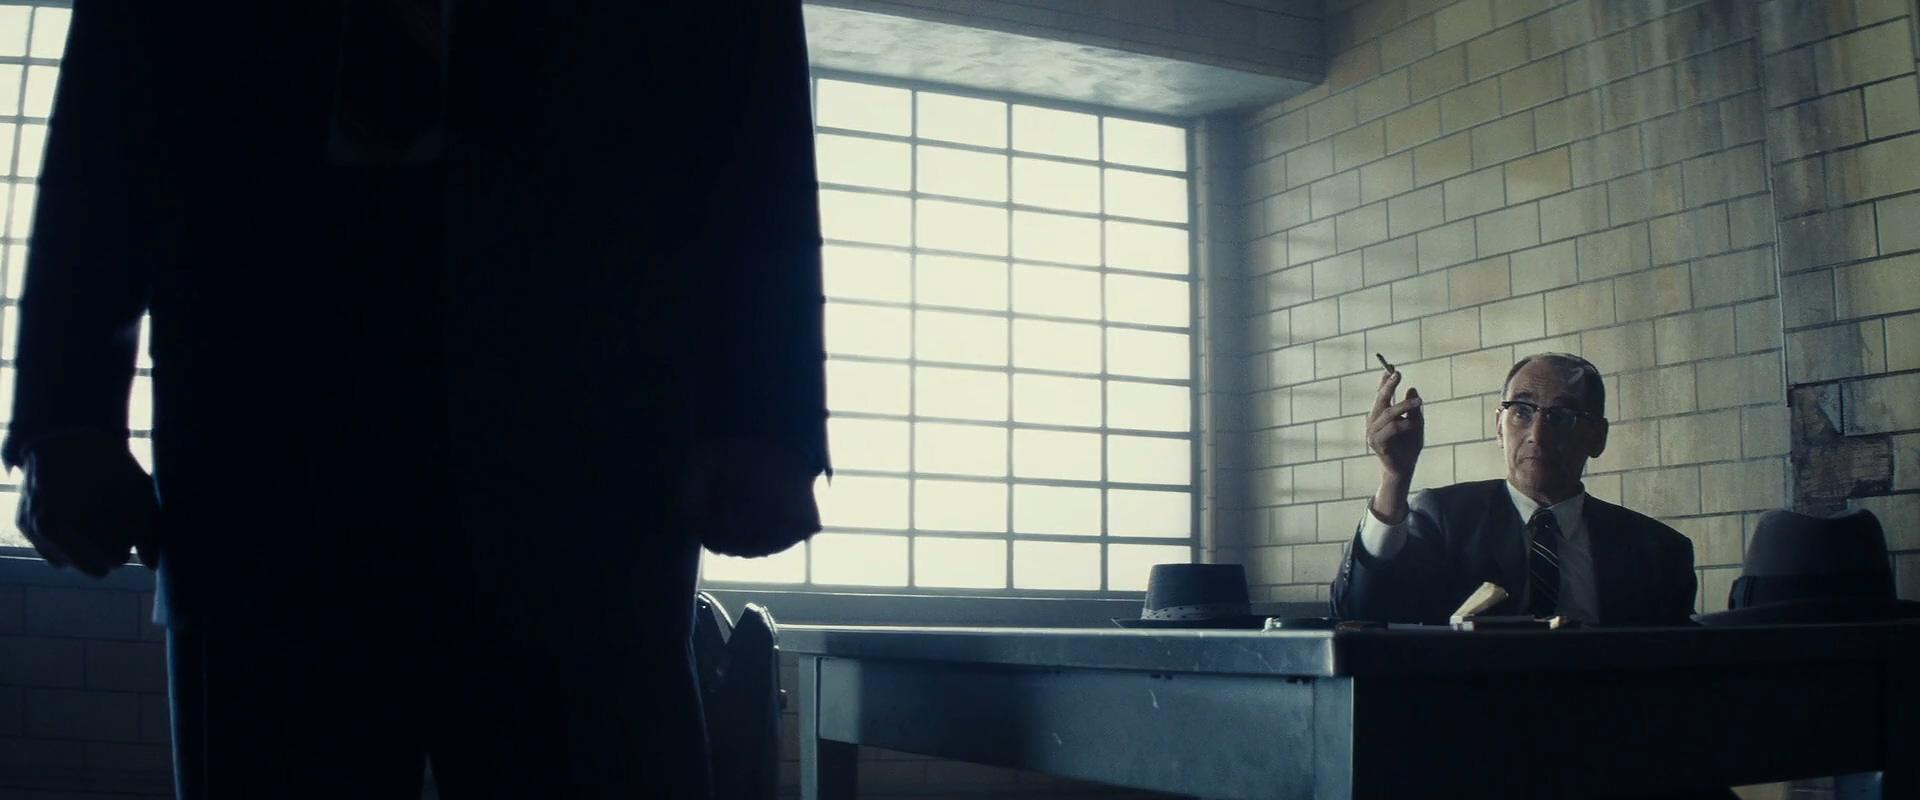 Tom Hanks and Mark Rylance in Bridge of Spies (2015)